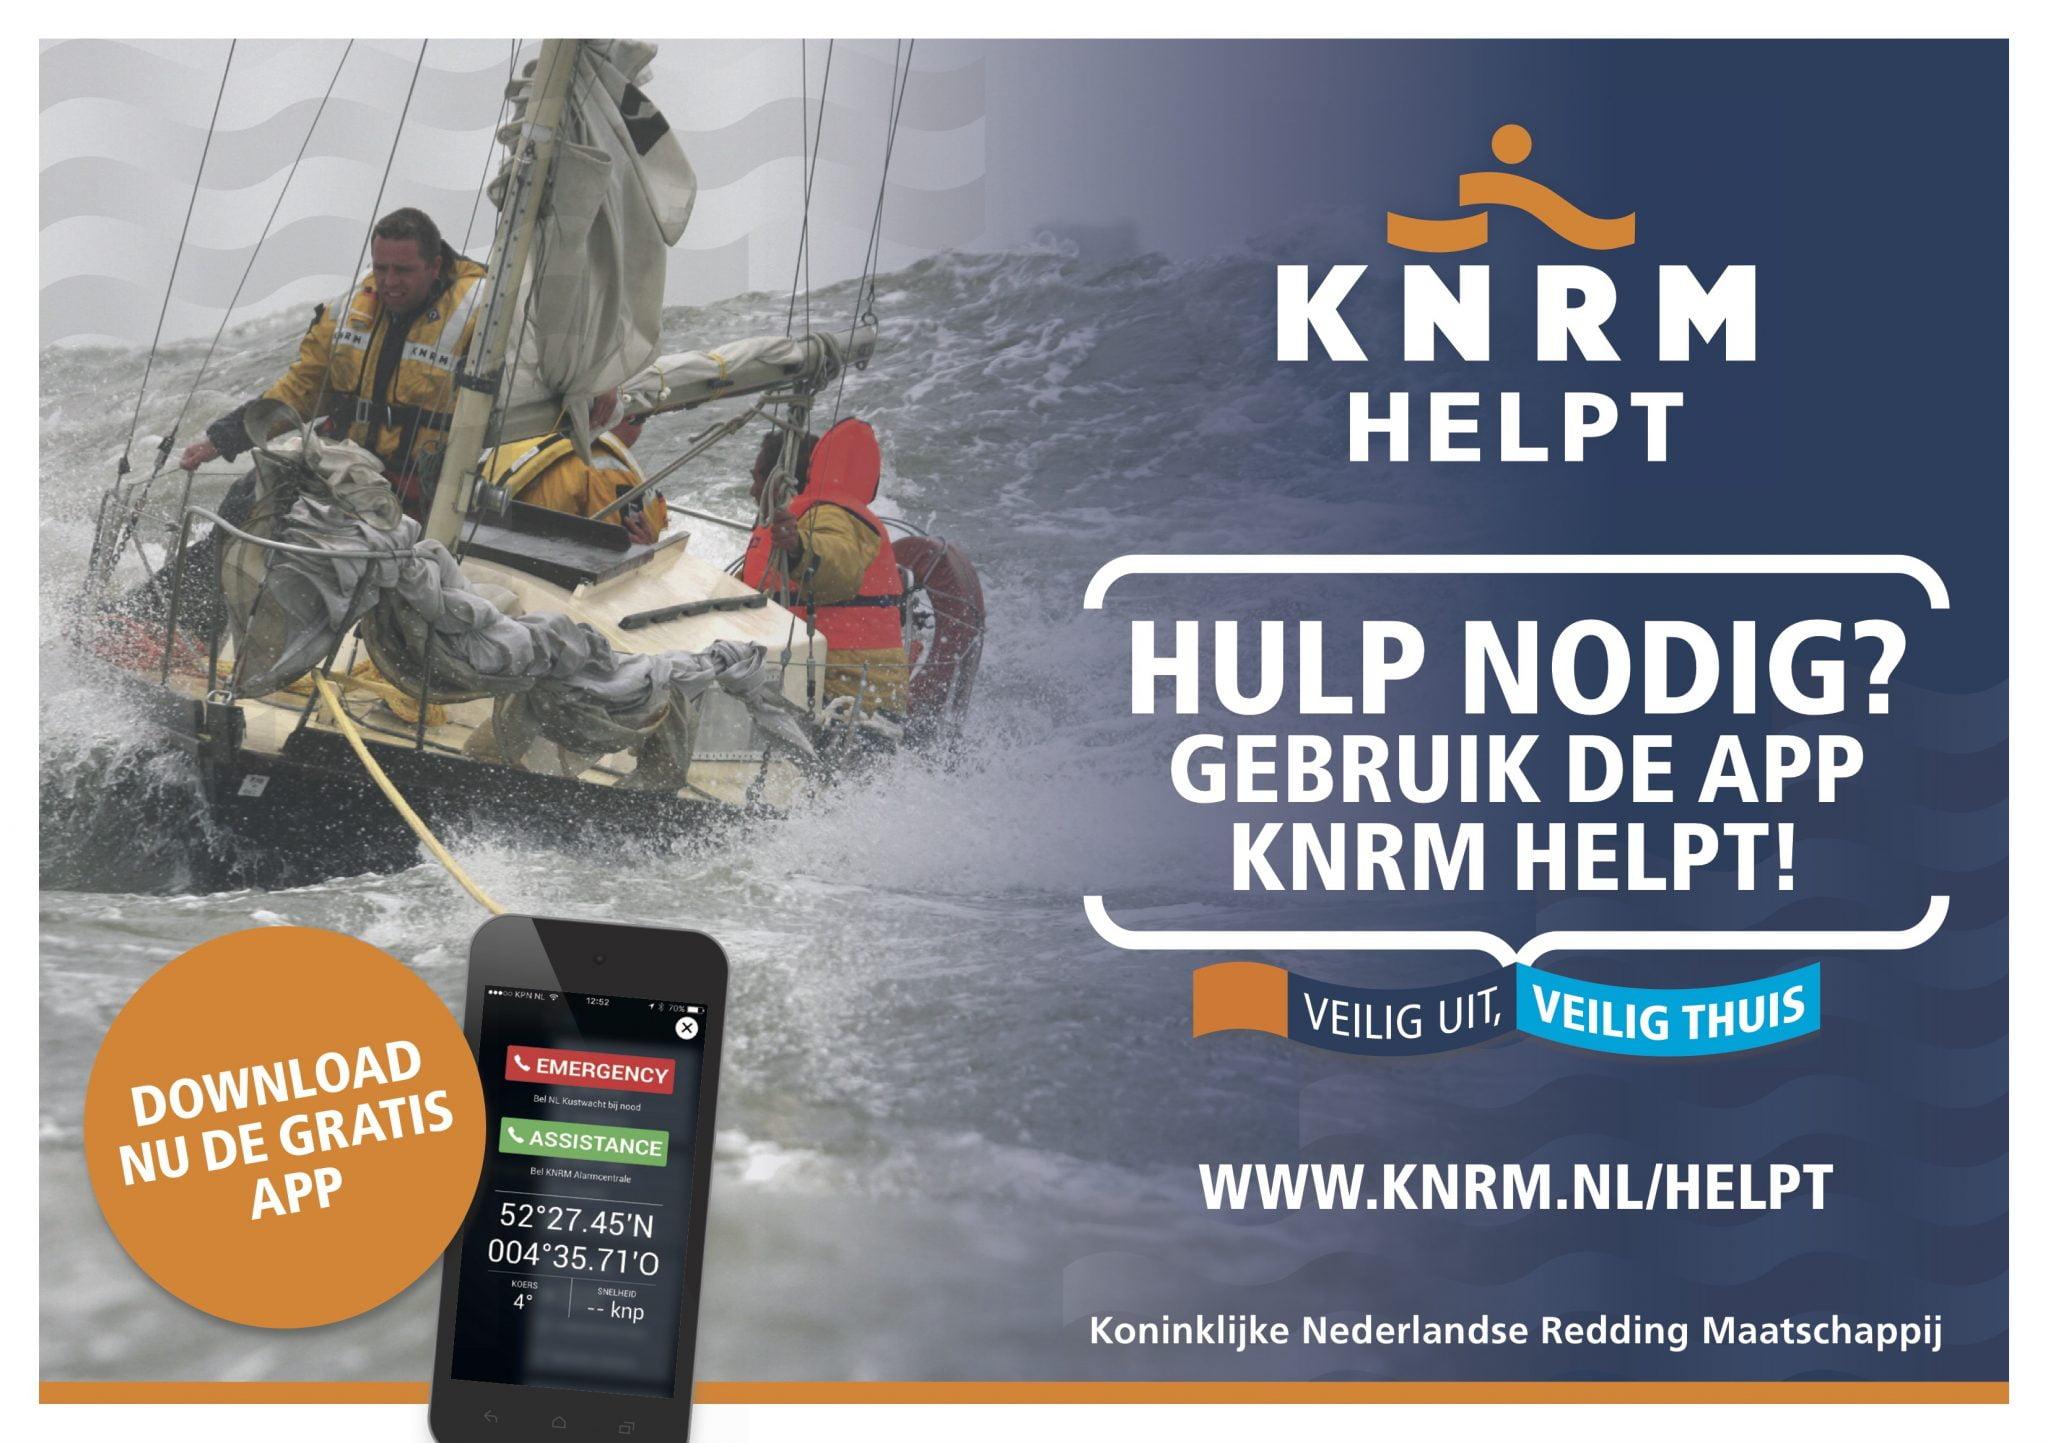 KNRM Helpt app